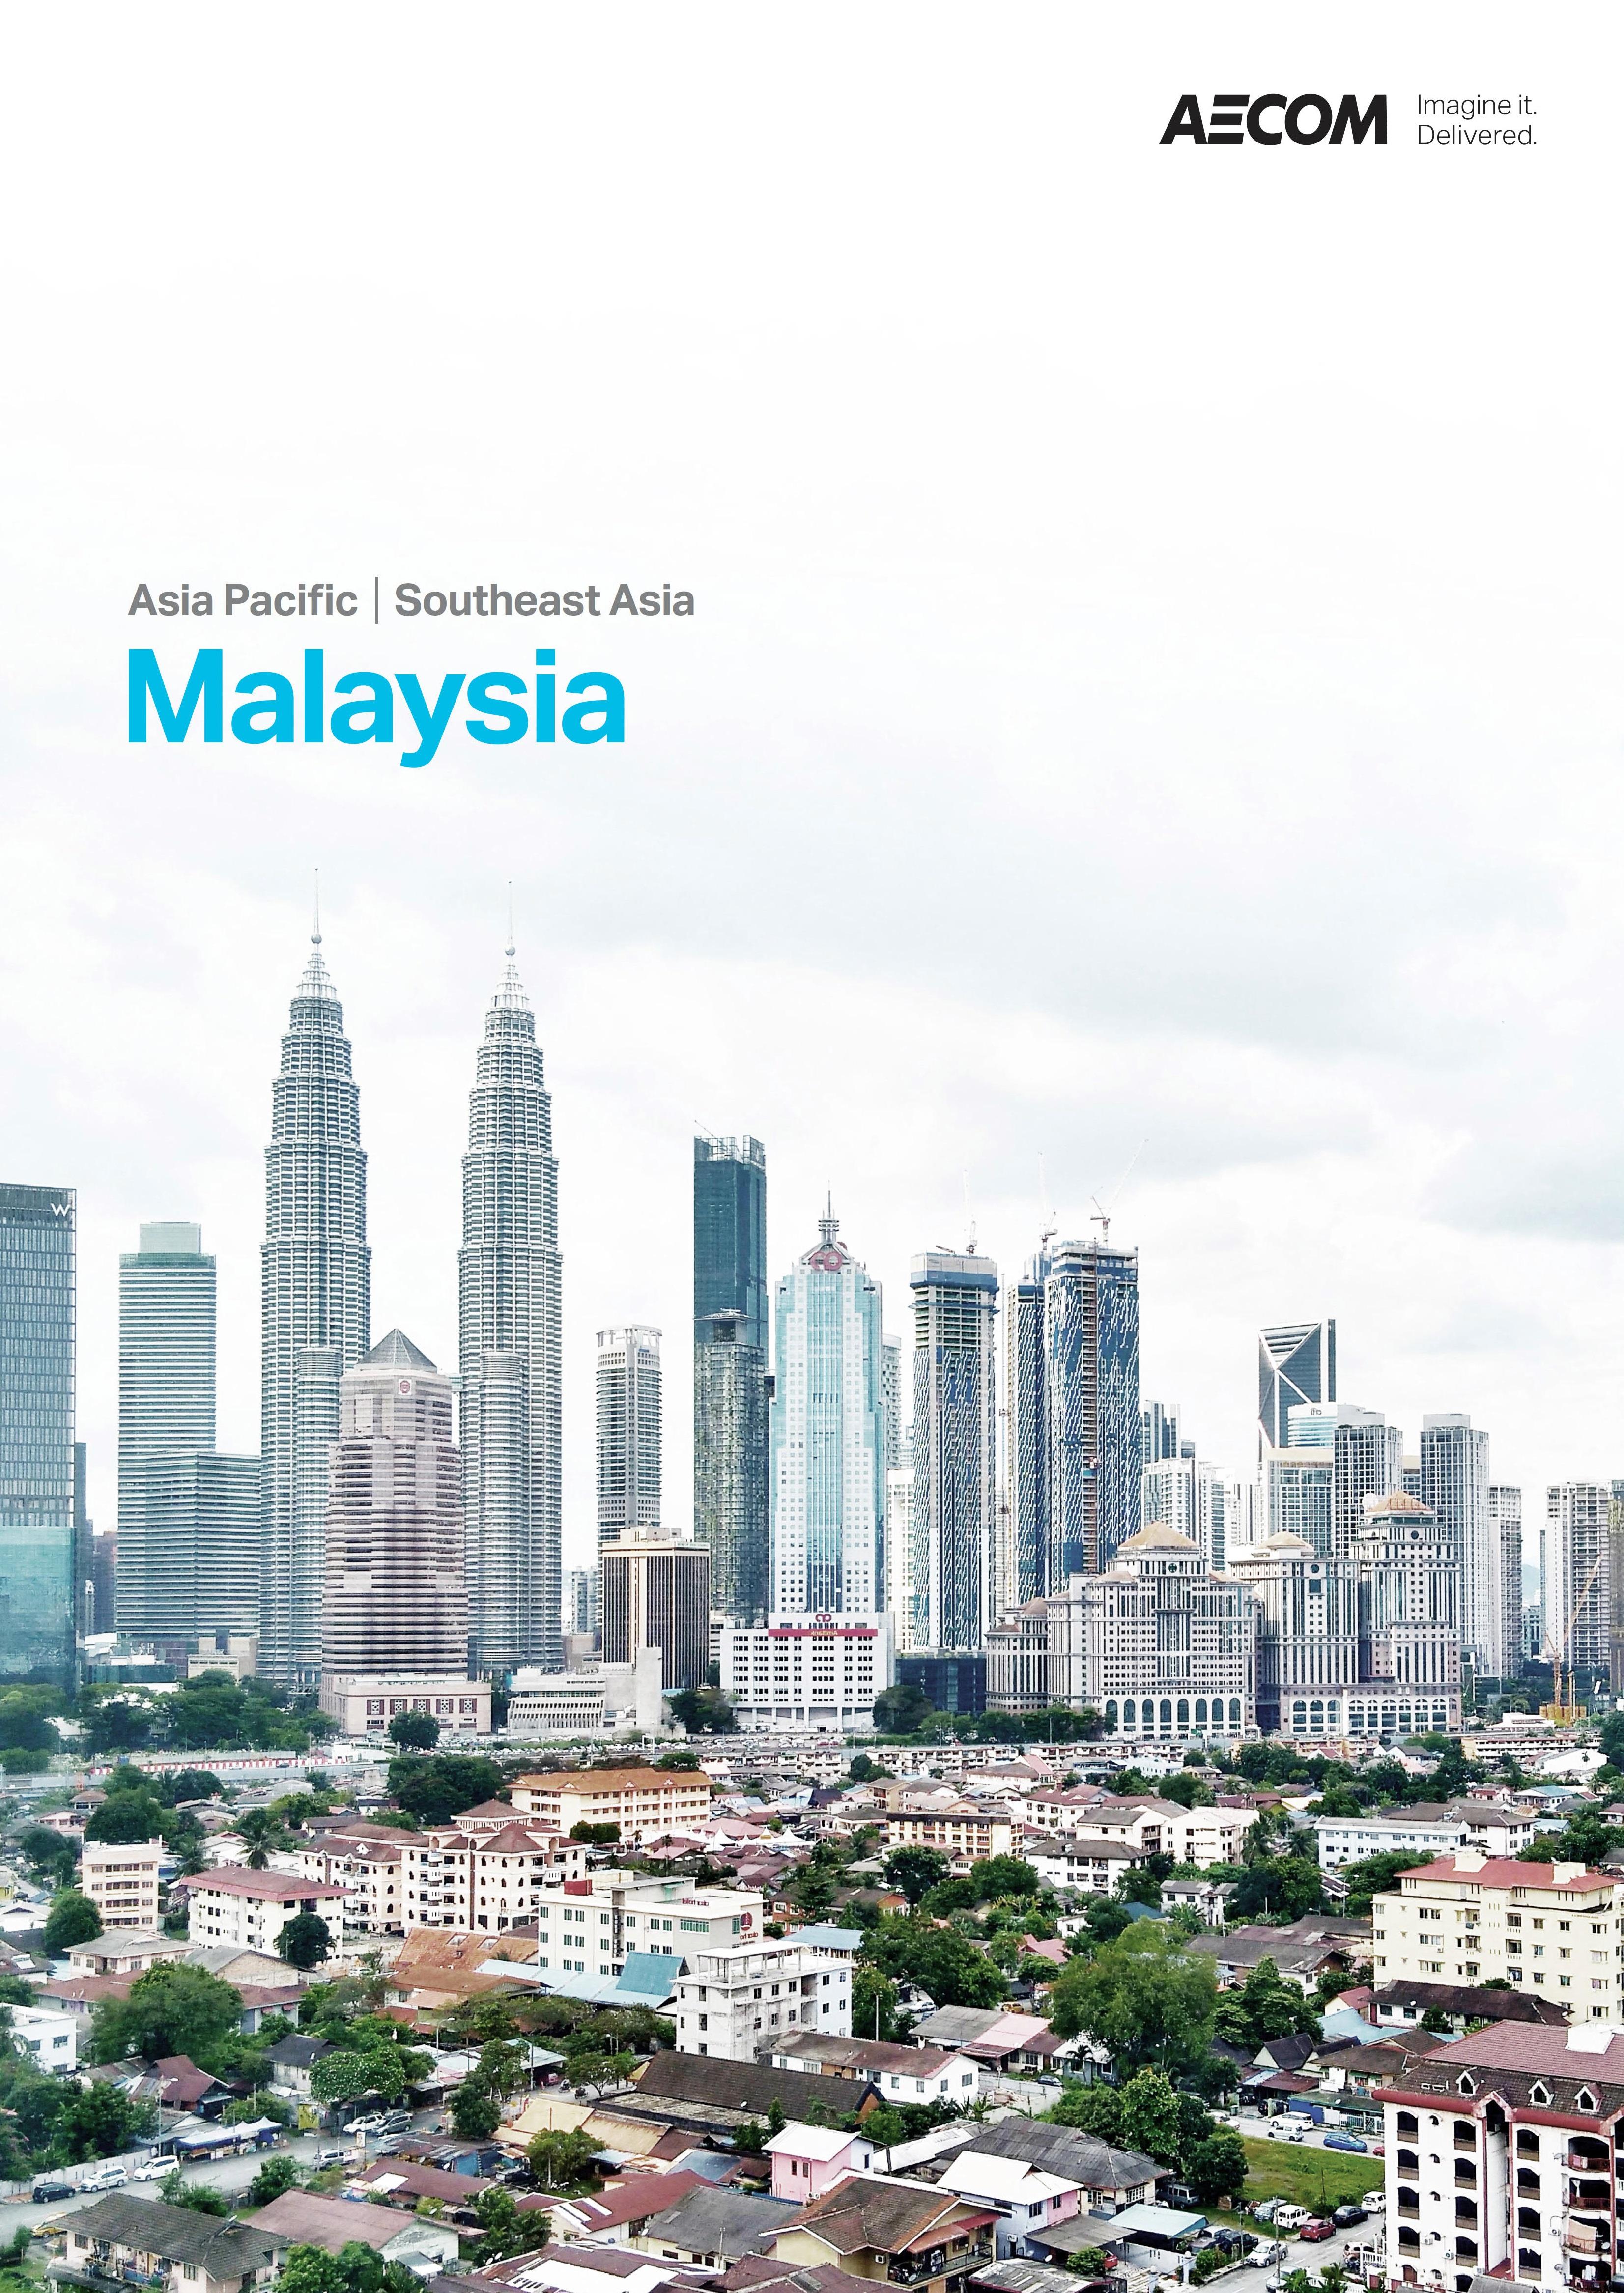 AECOM - Malaysia